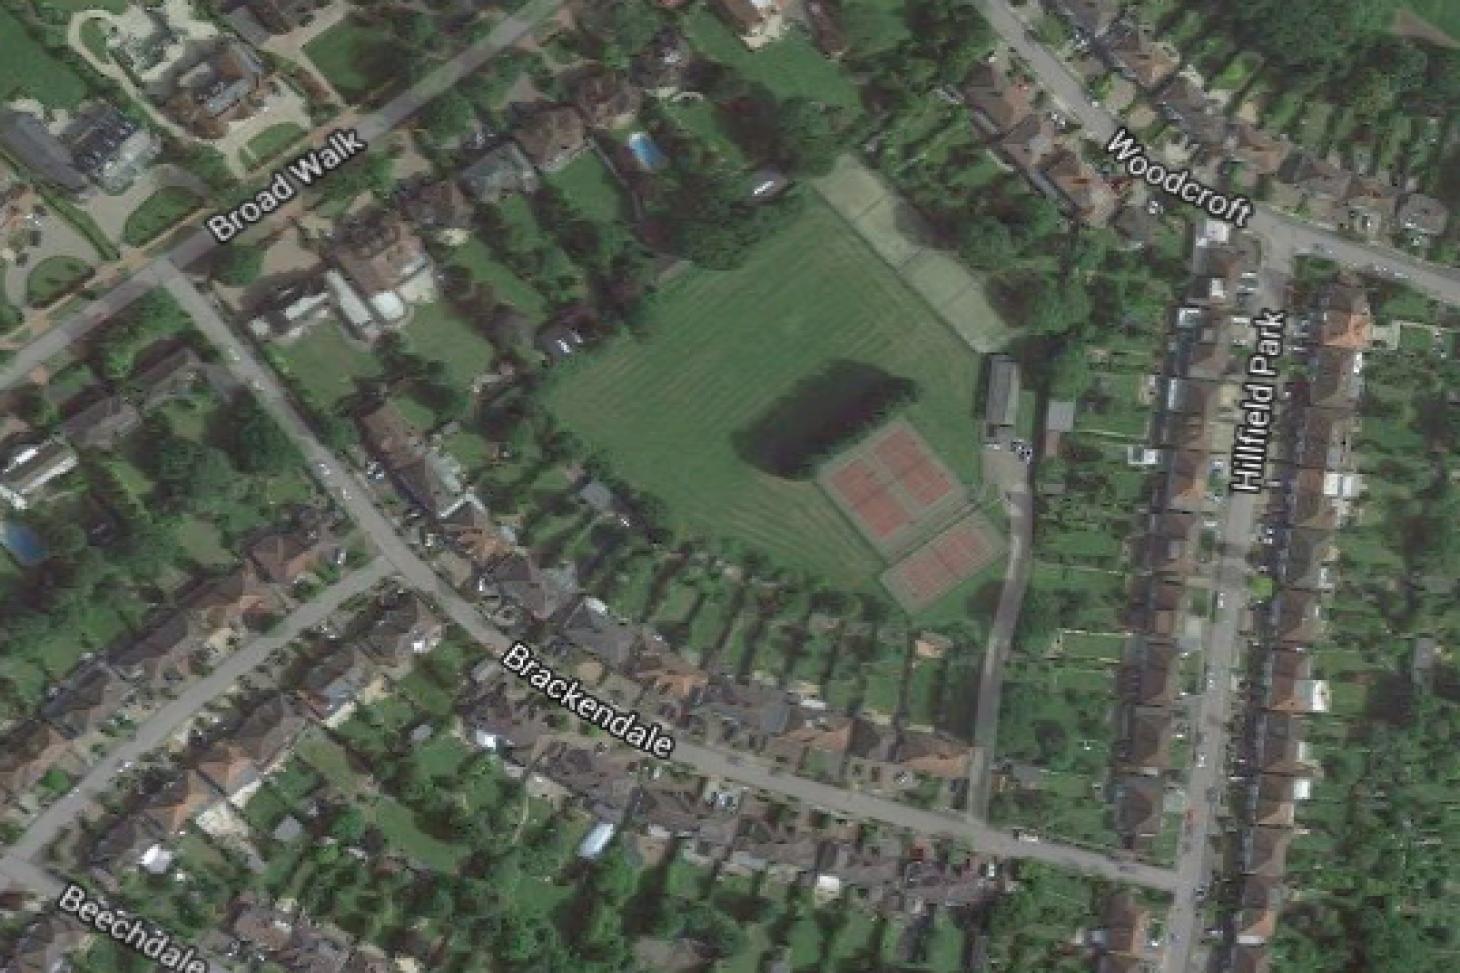 Brackendale Sports Ground 5 a side   Grass football pitch